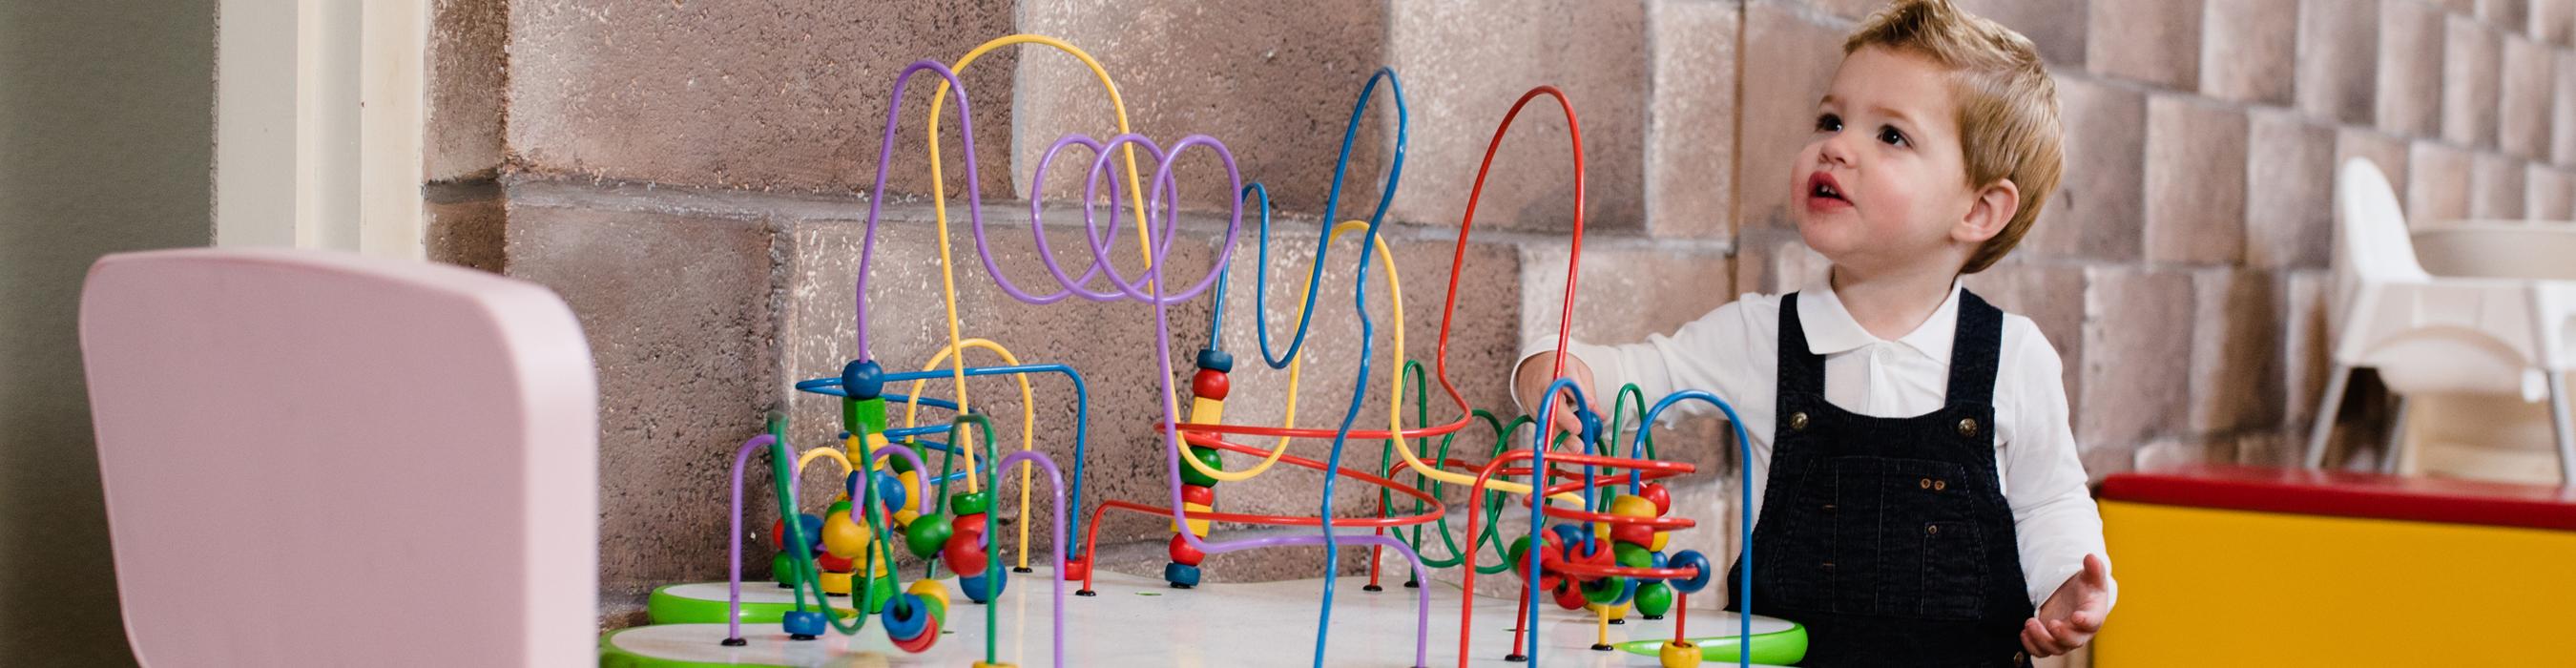 Afbeelding 3 - Kids Castle - Kinderspeelparadijs